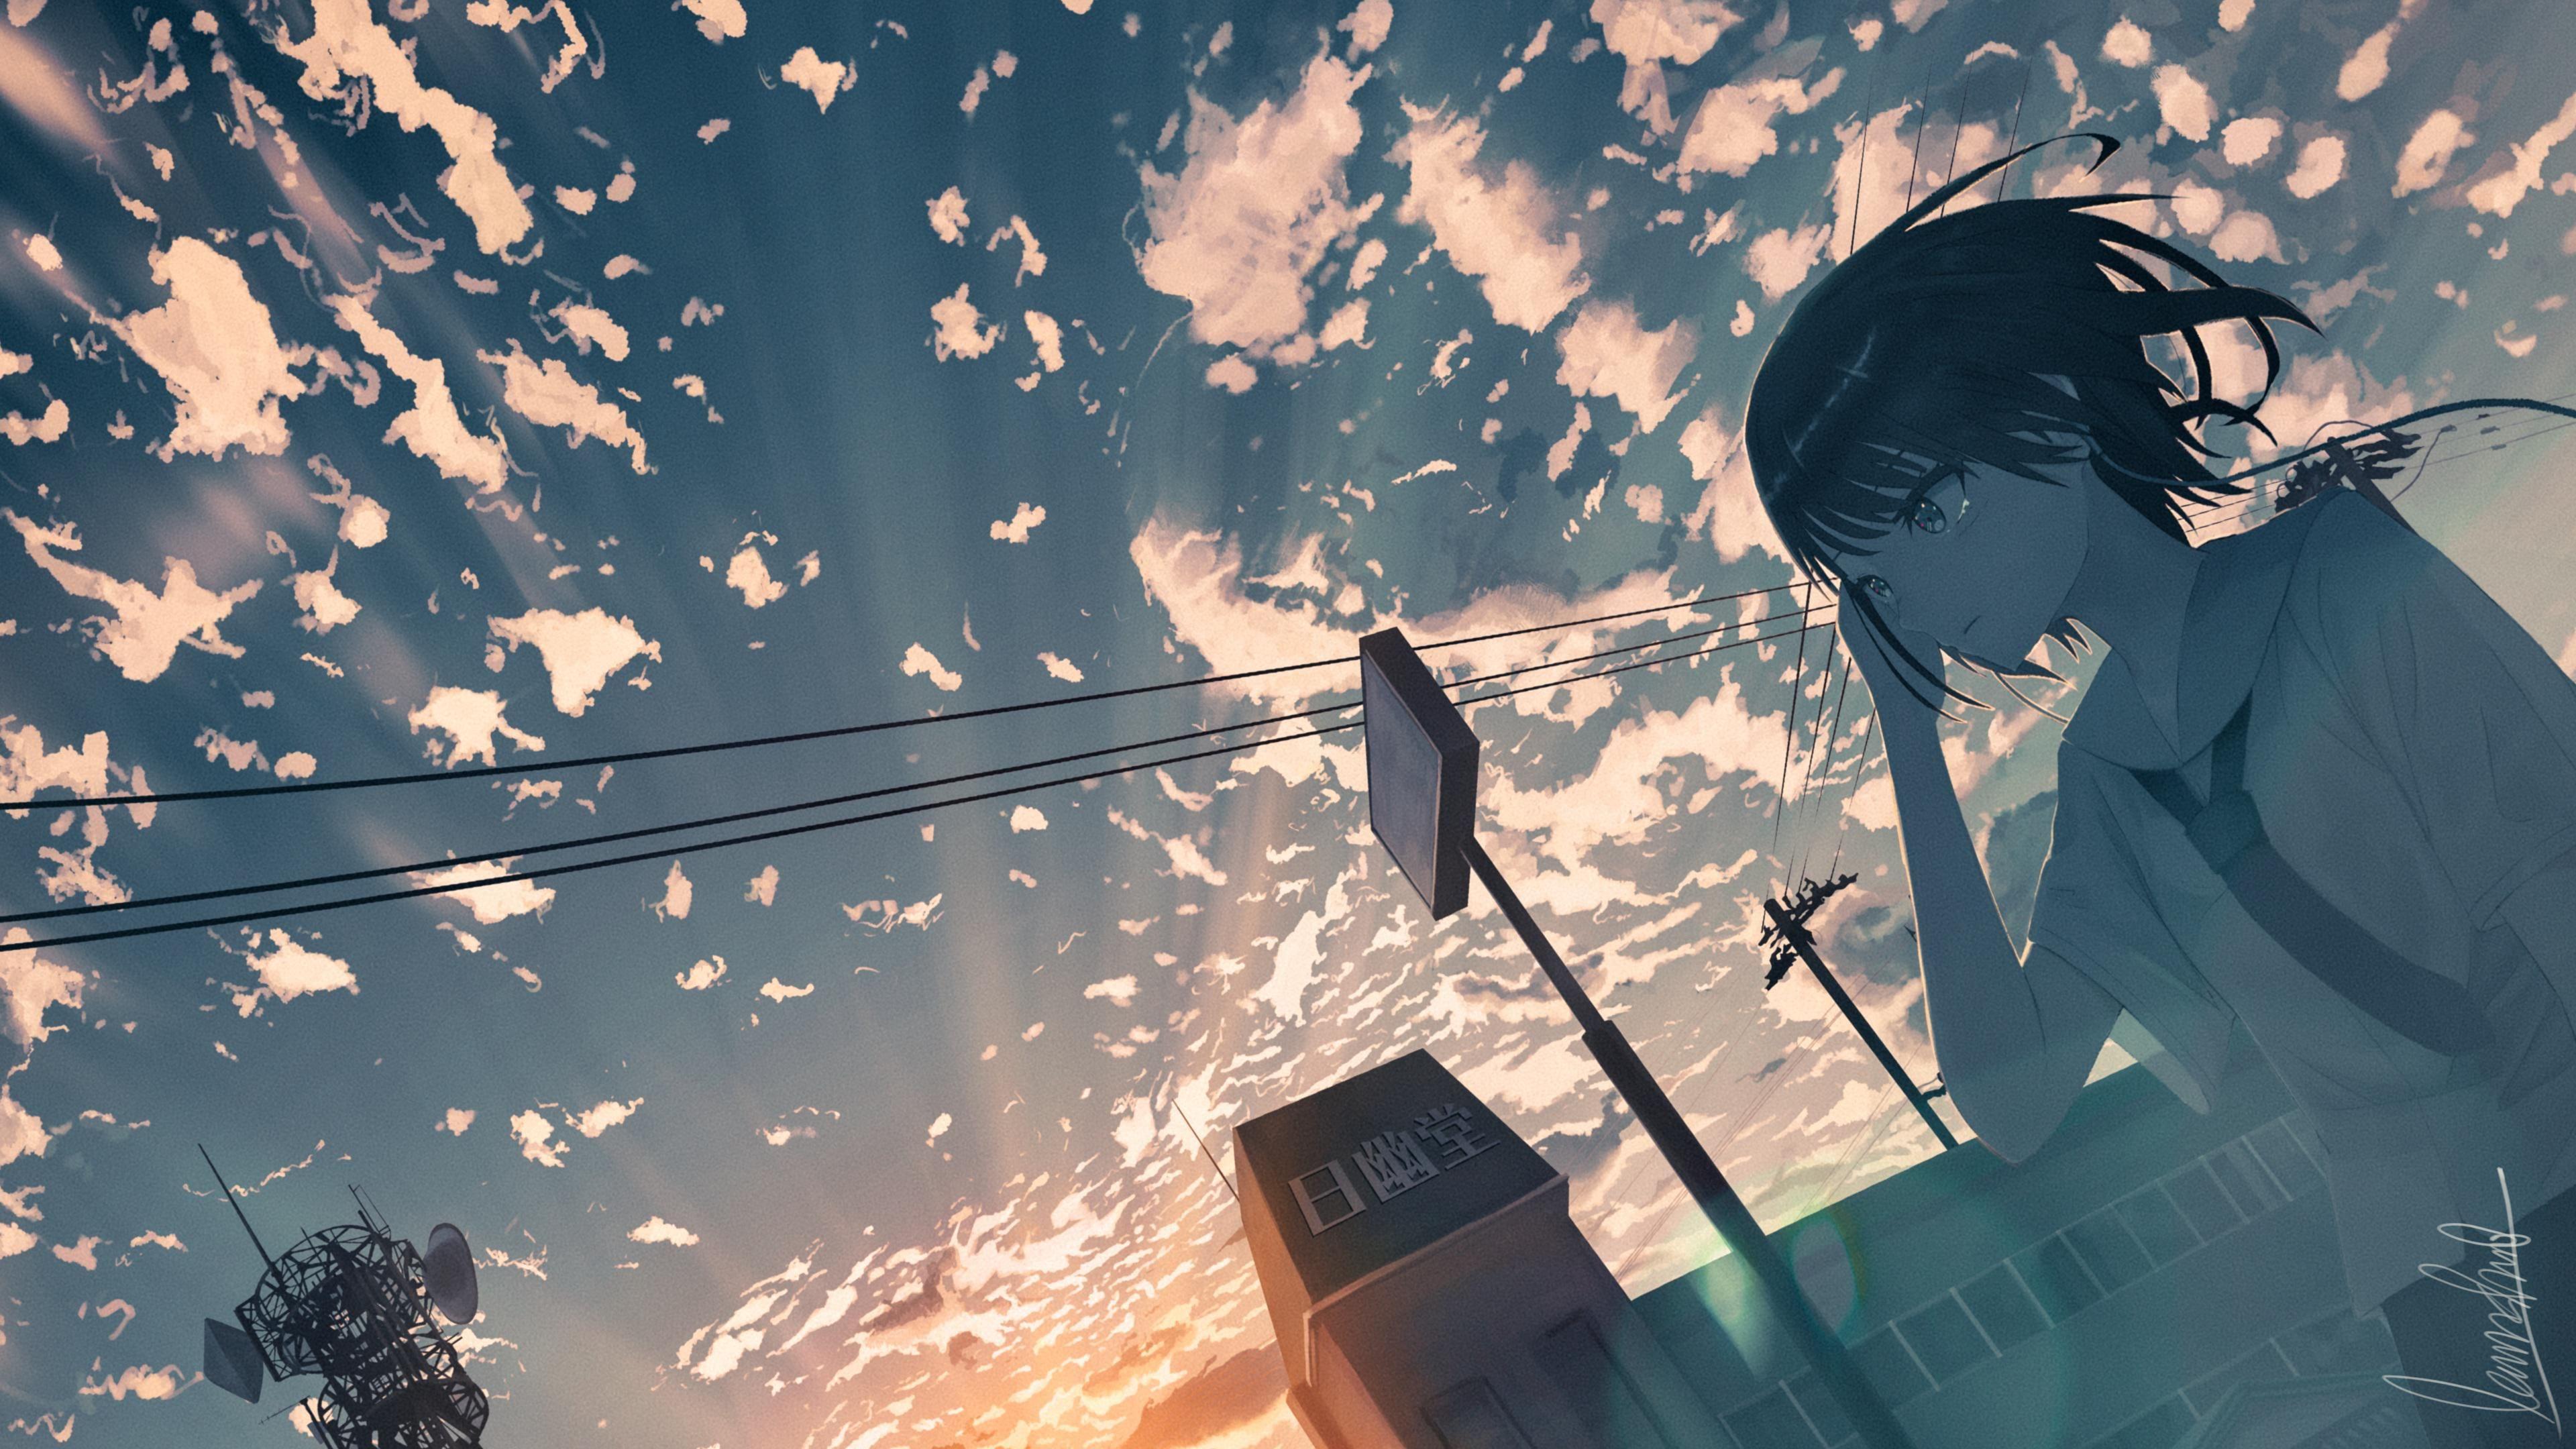 Pin By Bogdan Teodoru On Desktop Wallpapers Anime Wallpaper Download Cool Anime Wallpapers Hd Anime Wallpapers 31 anime landscape wallpaper